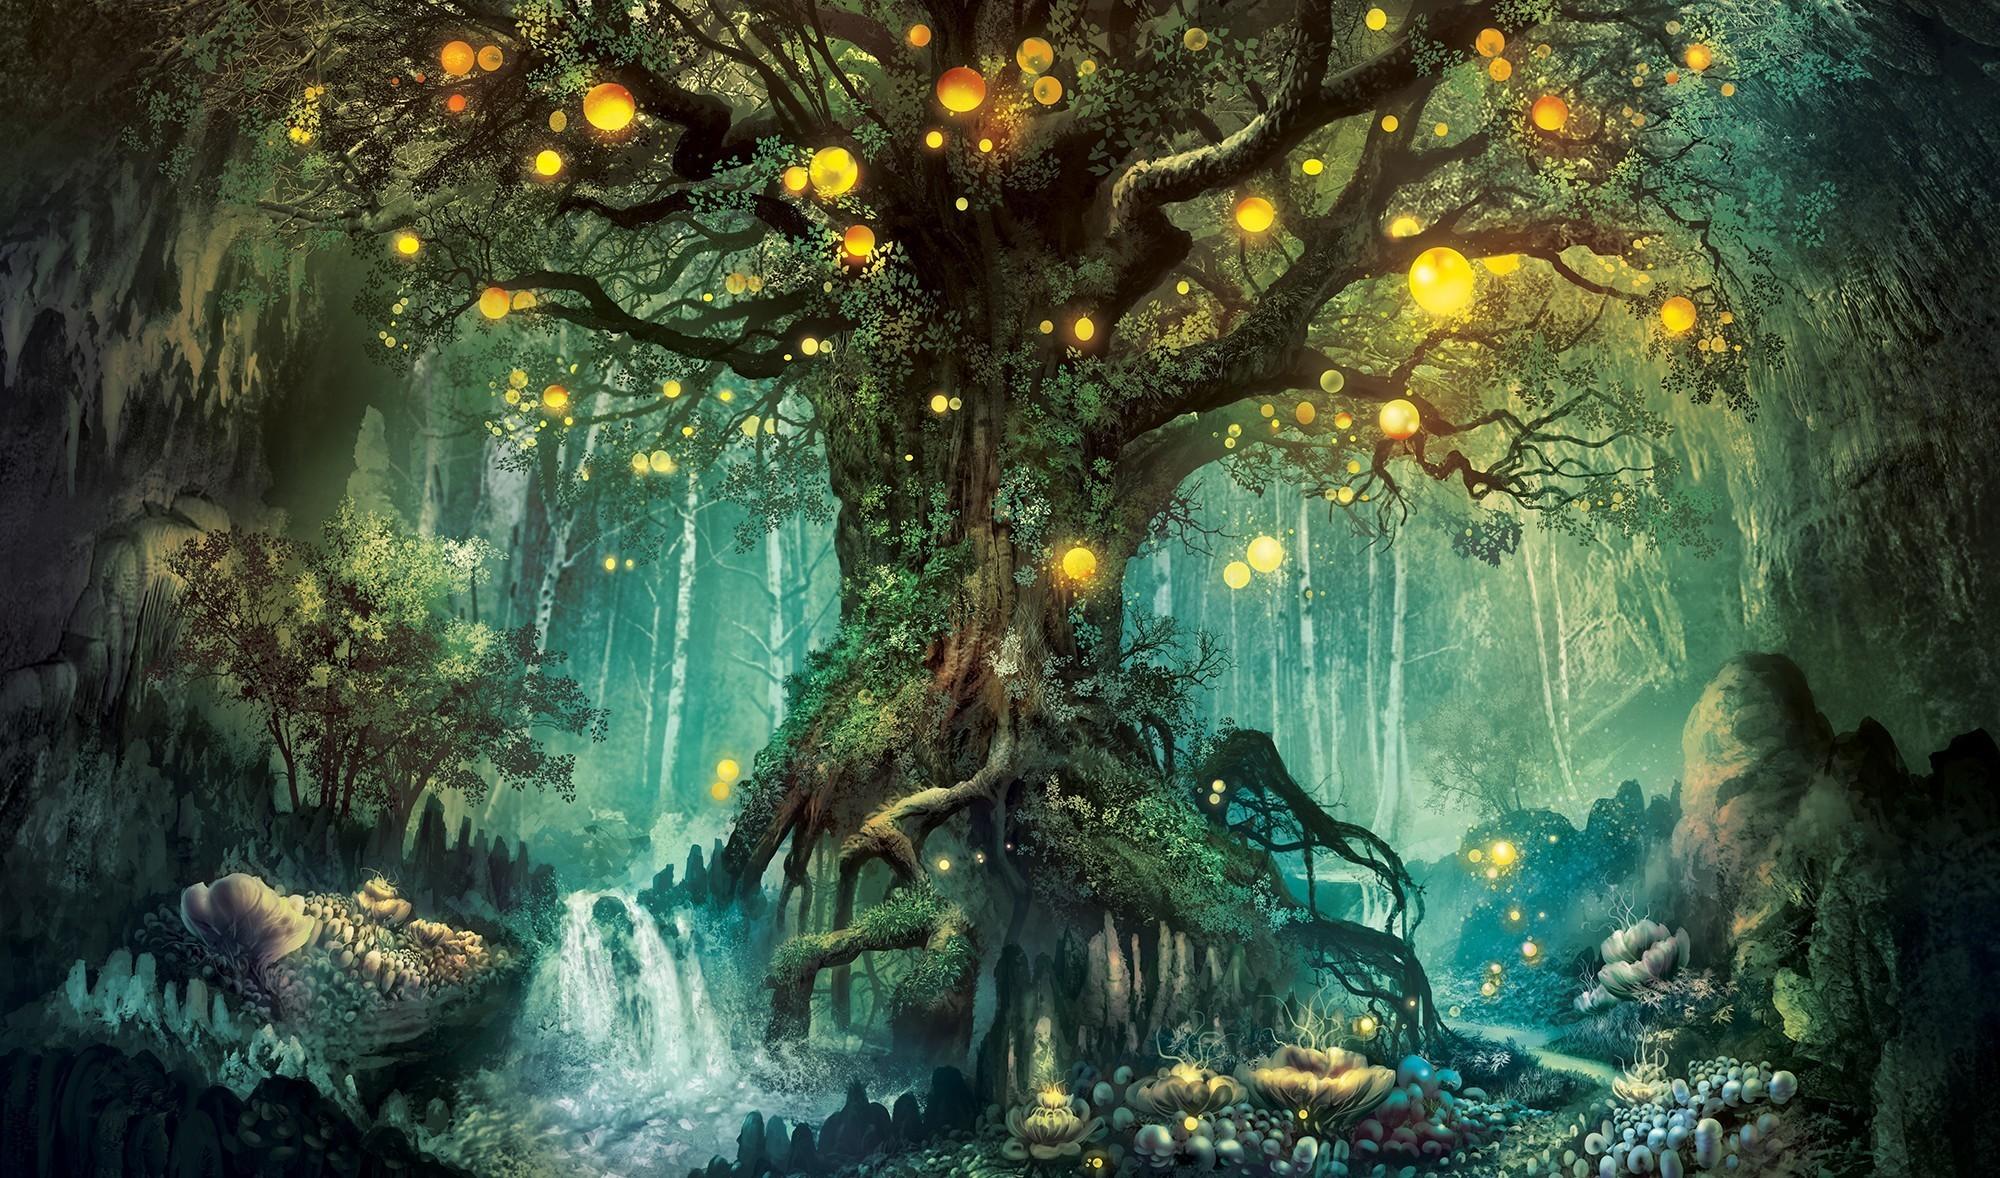 картинки деревья фэнтези мхи папоротники